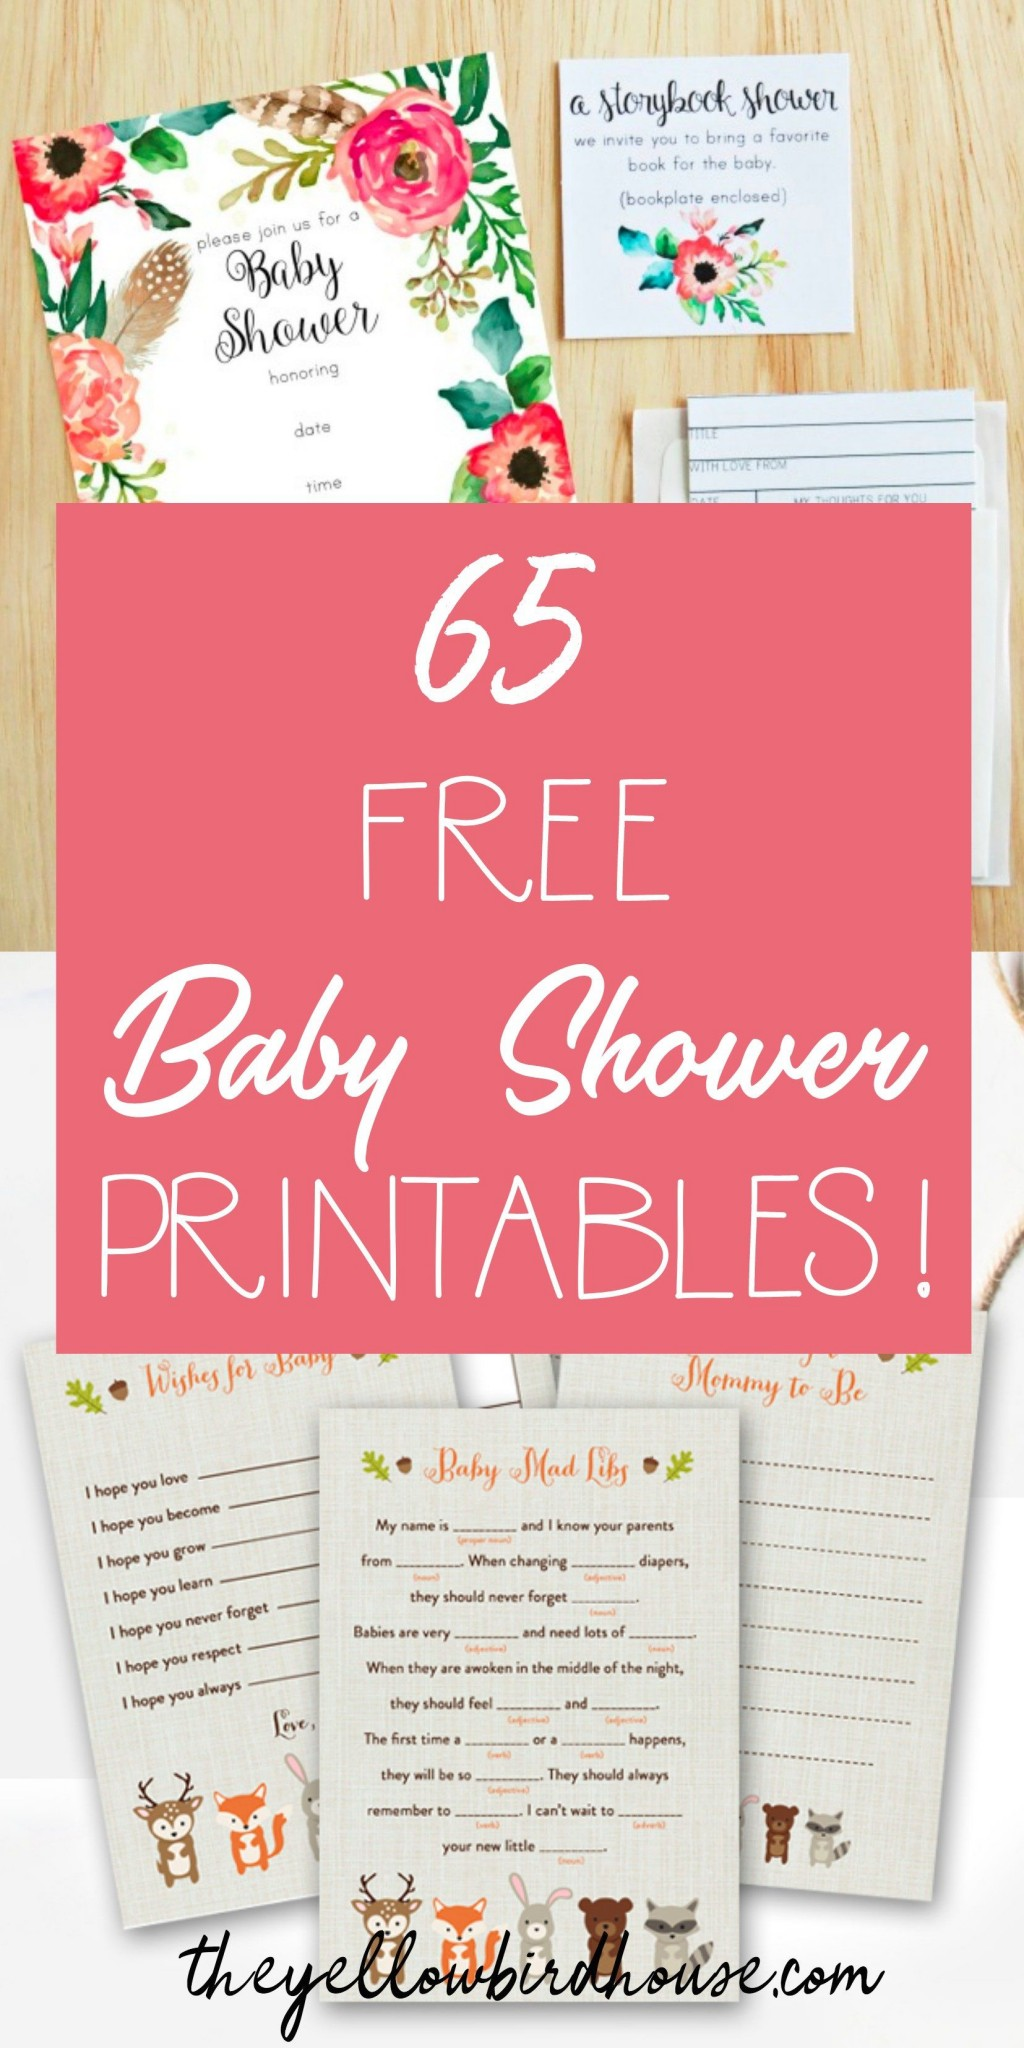 009 Simple Free Baby Shower Printable Elephant Inspiration  DecorationLarge